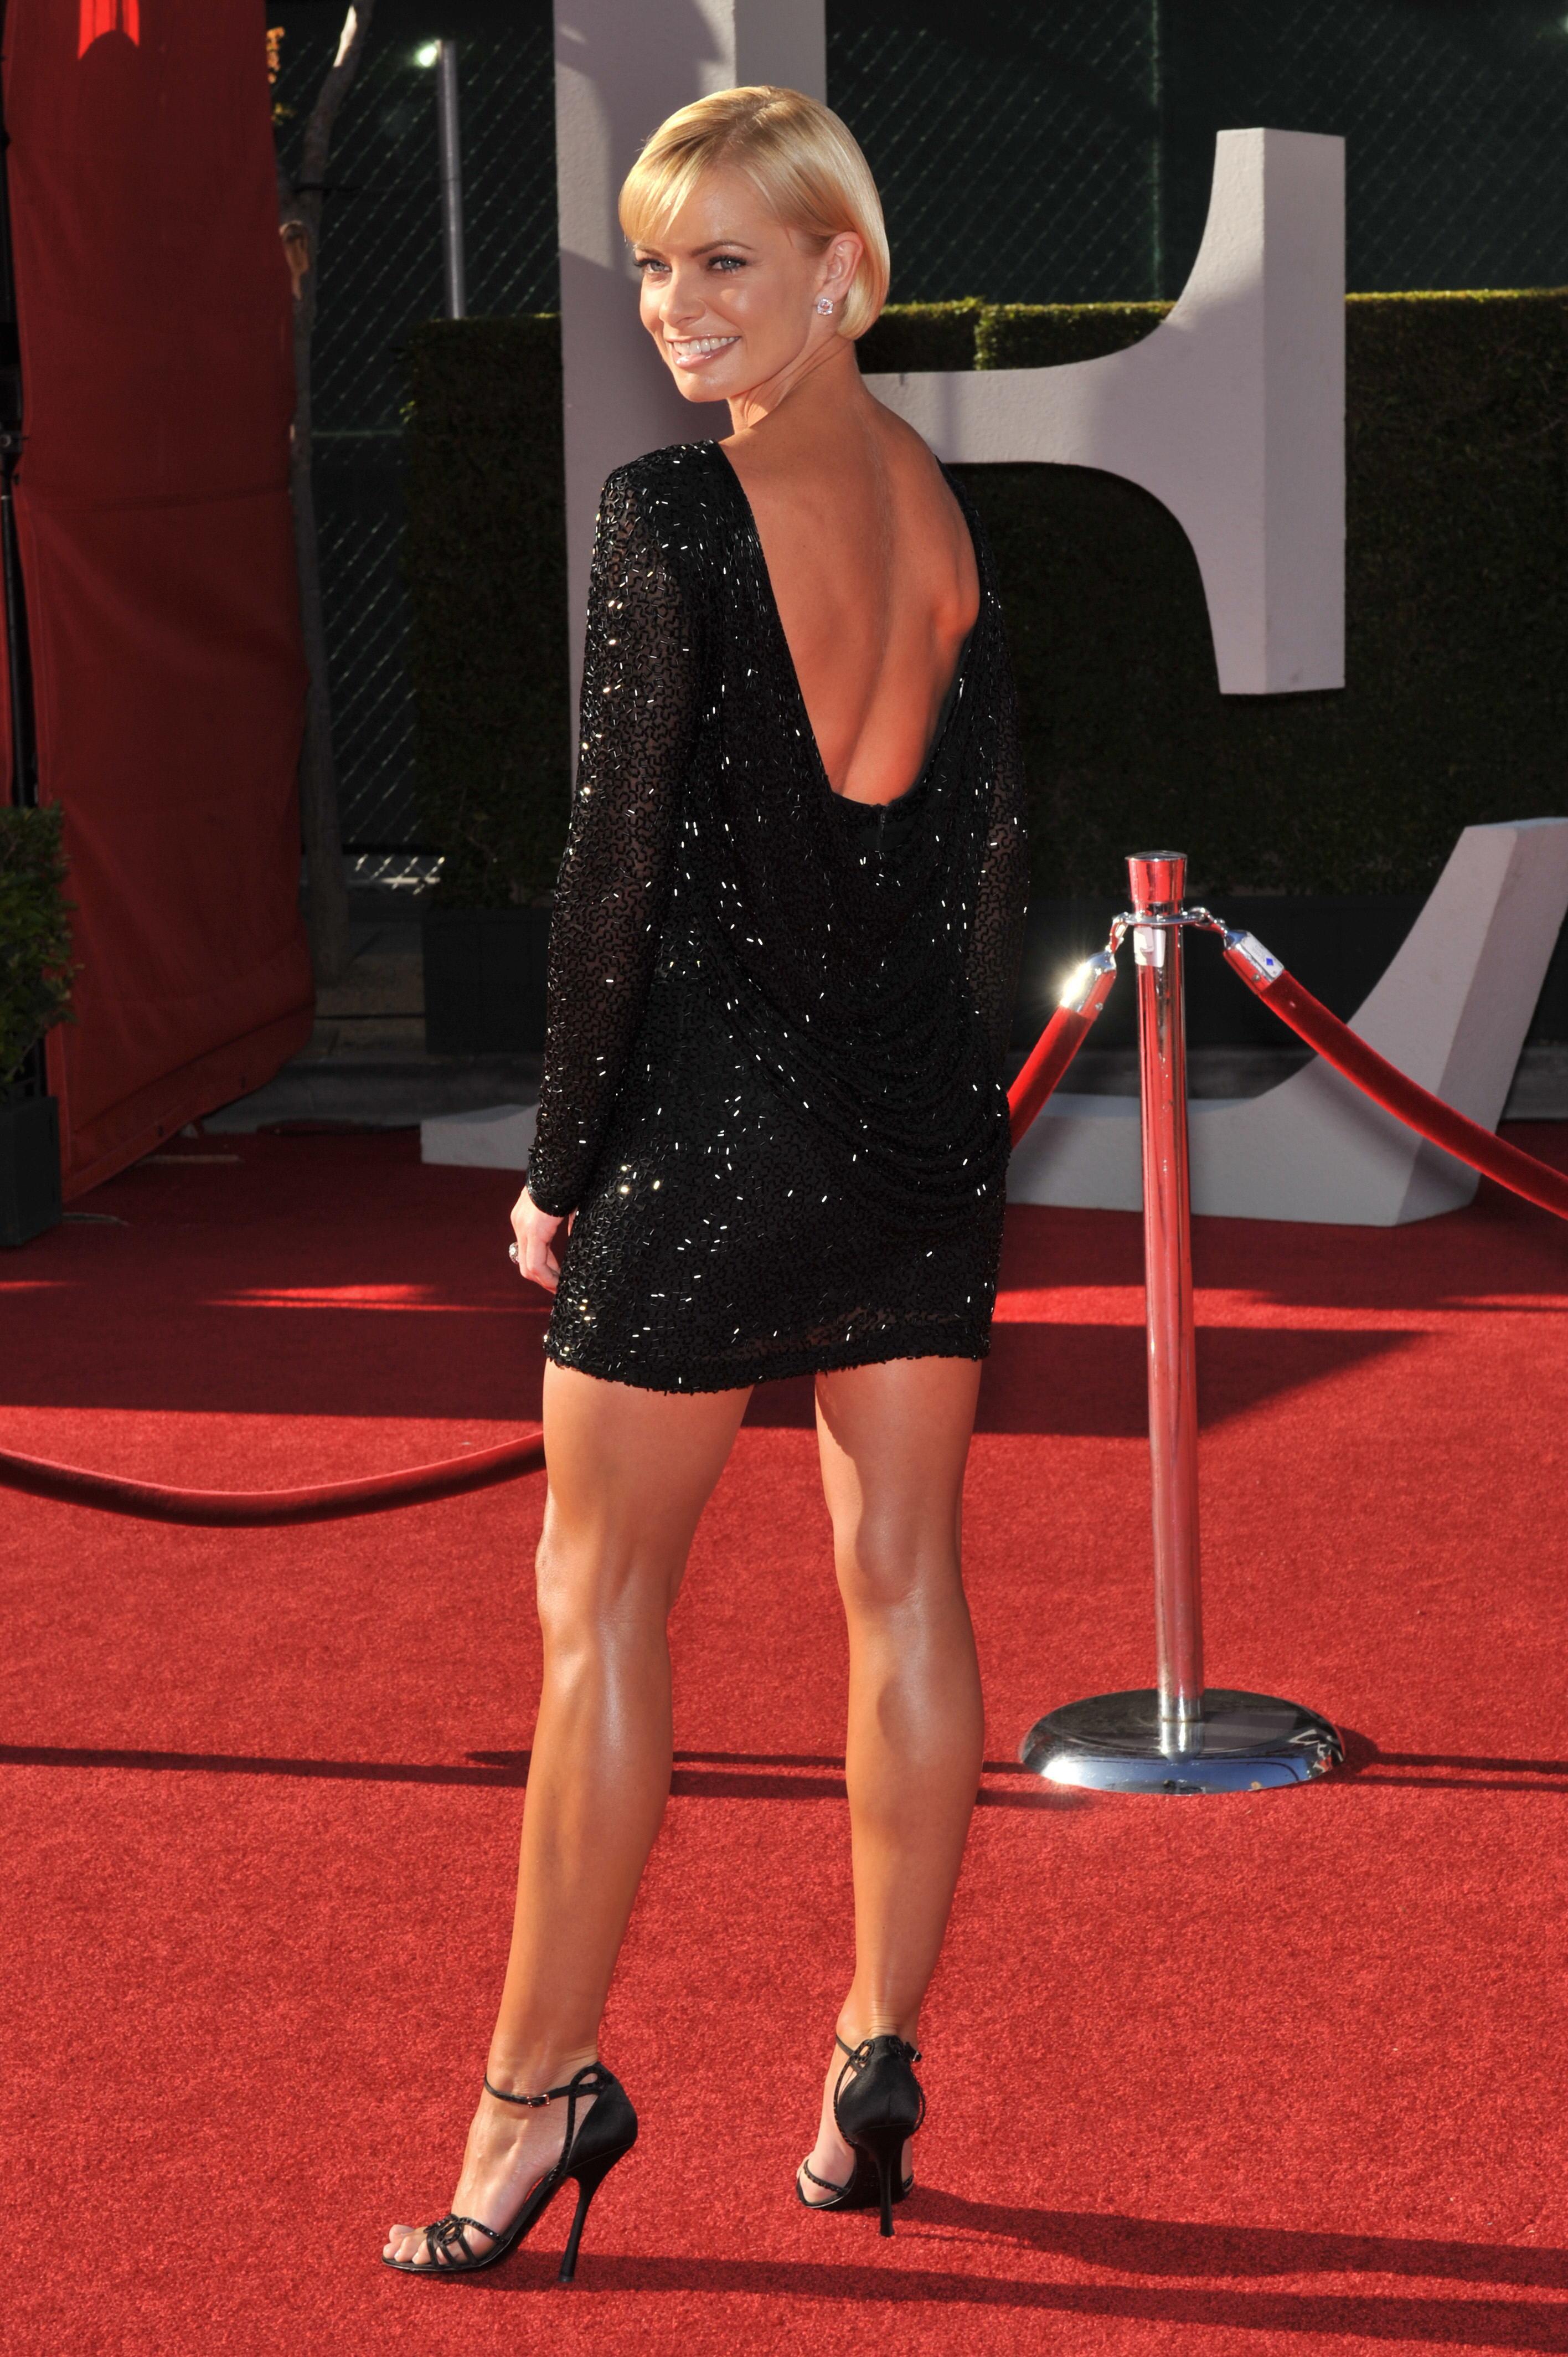 Celebrity Legs - General Discussion - Bellazon